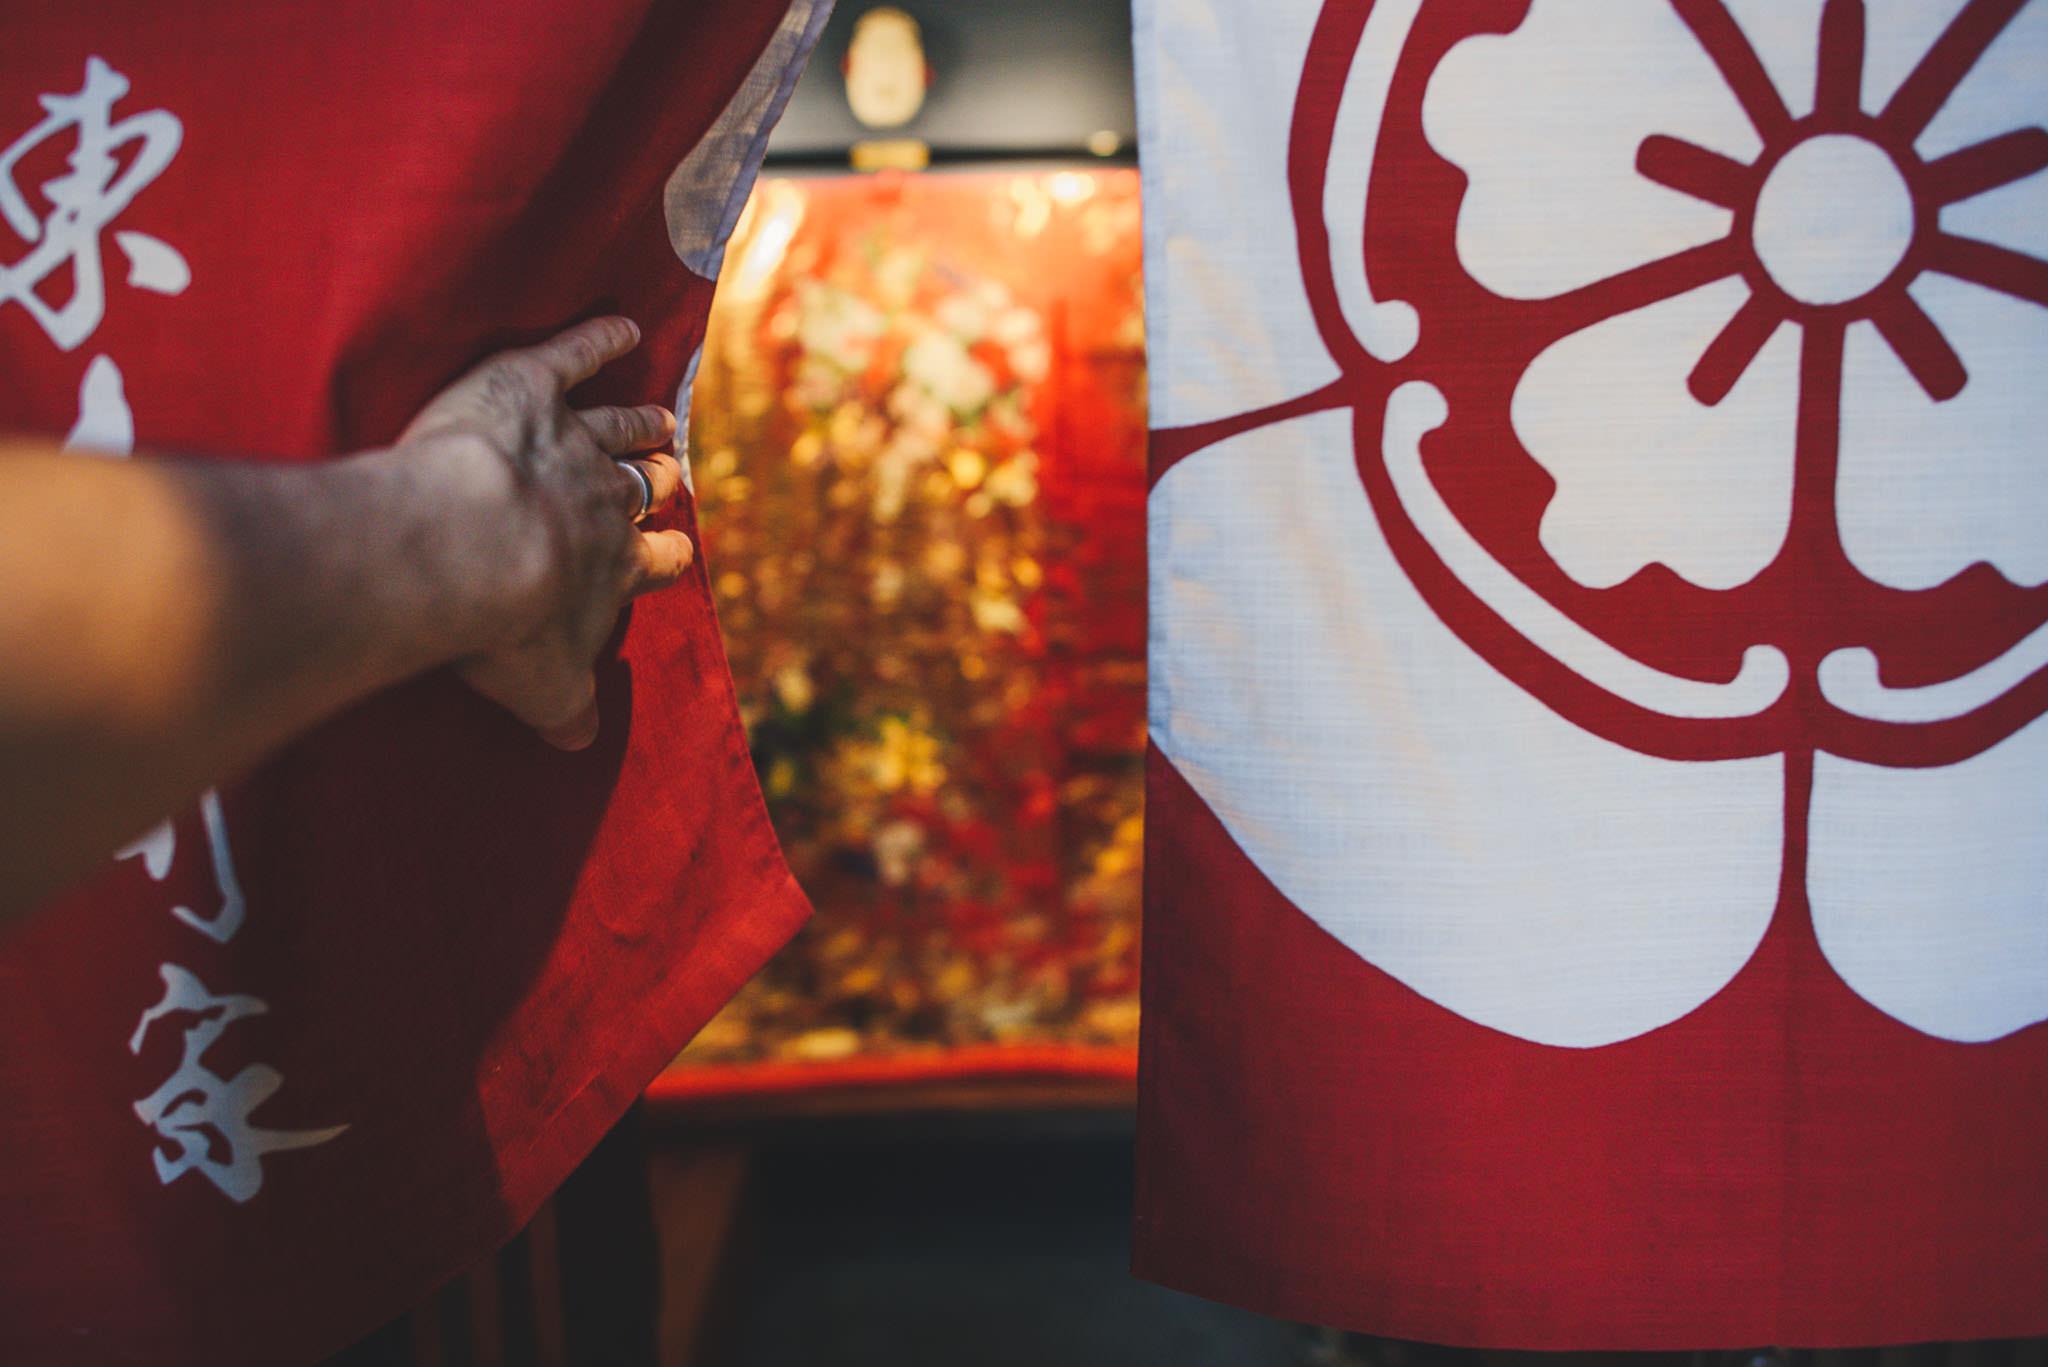 japan-wedding-photography-by-roberto-panciatici-photography-01